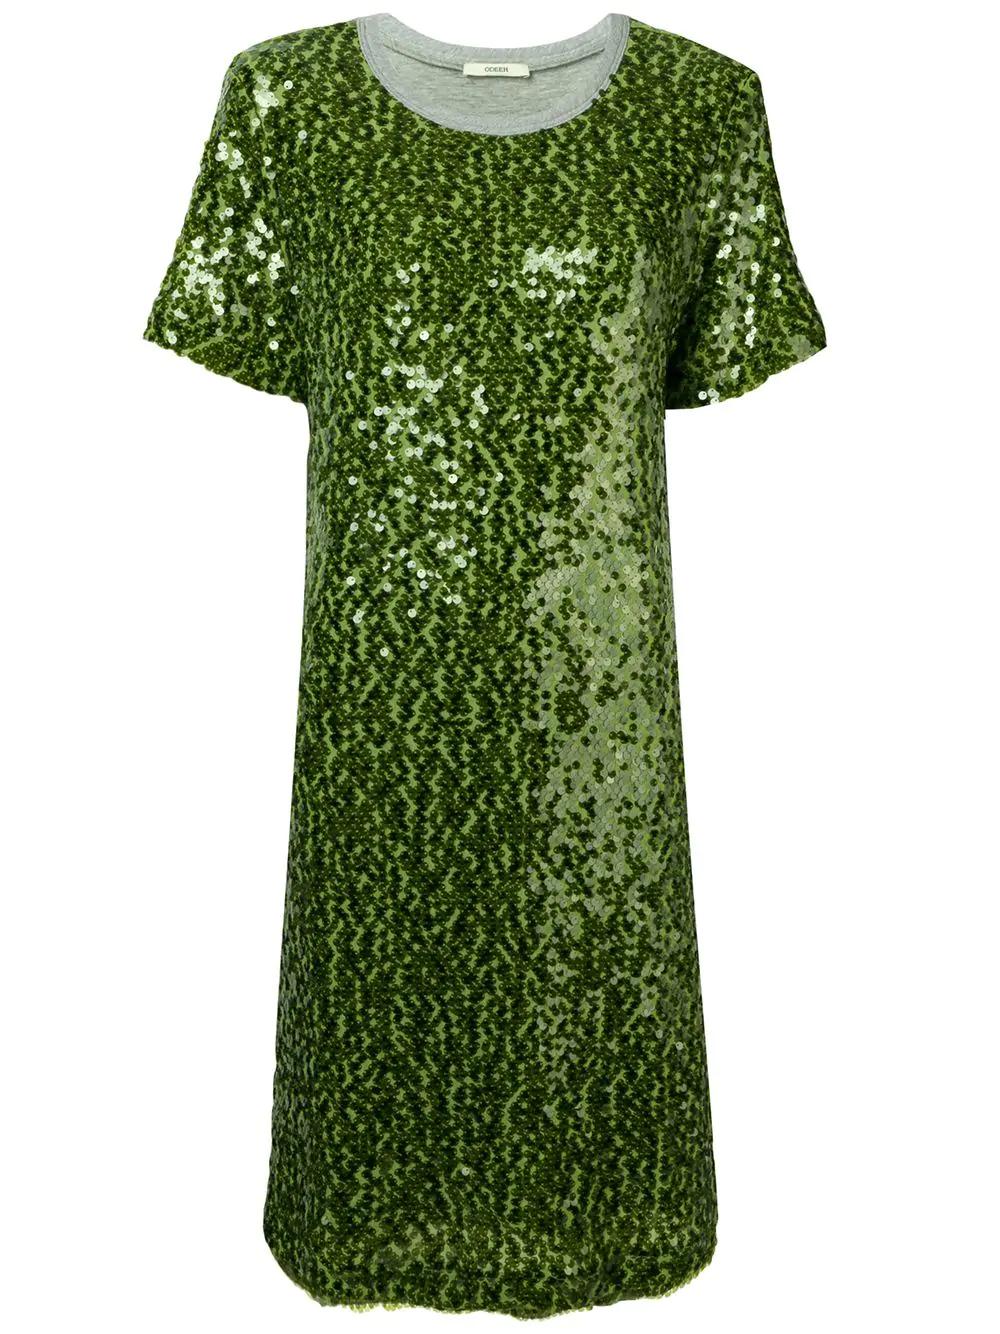 T shirt kleid grun